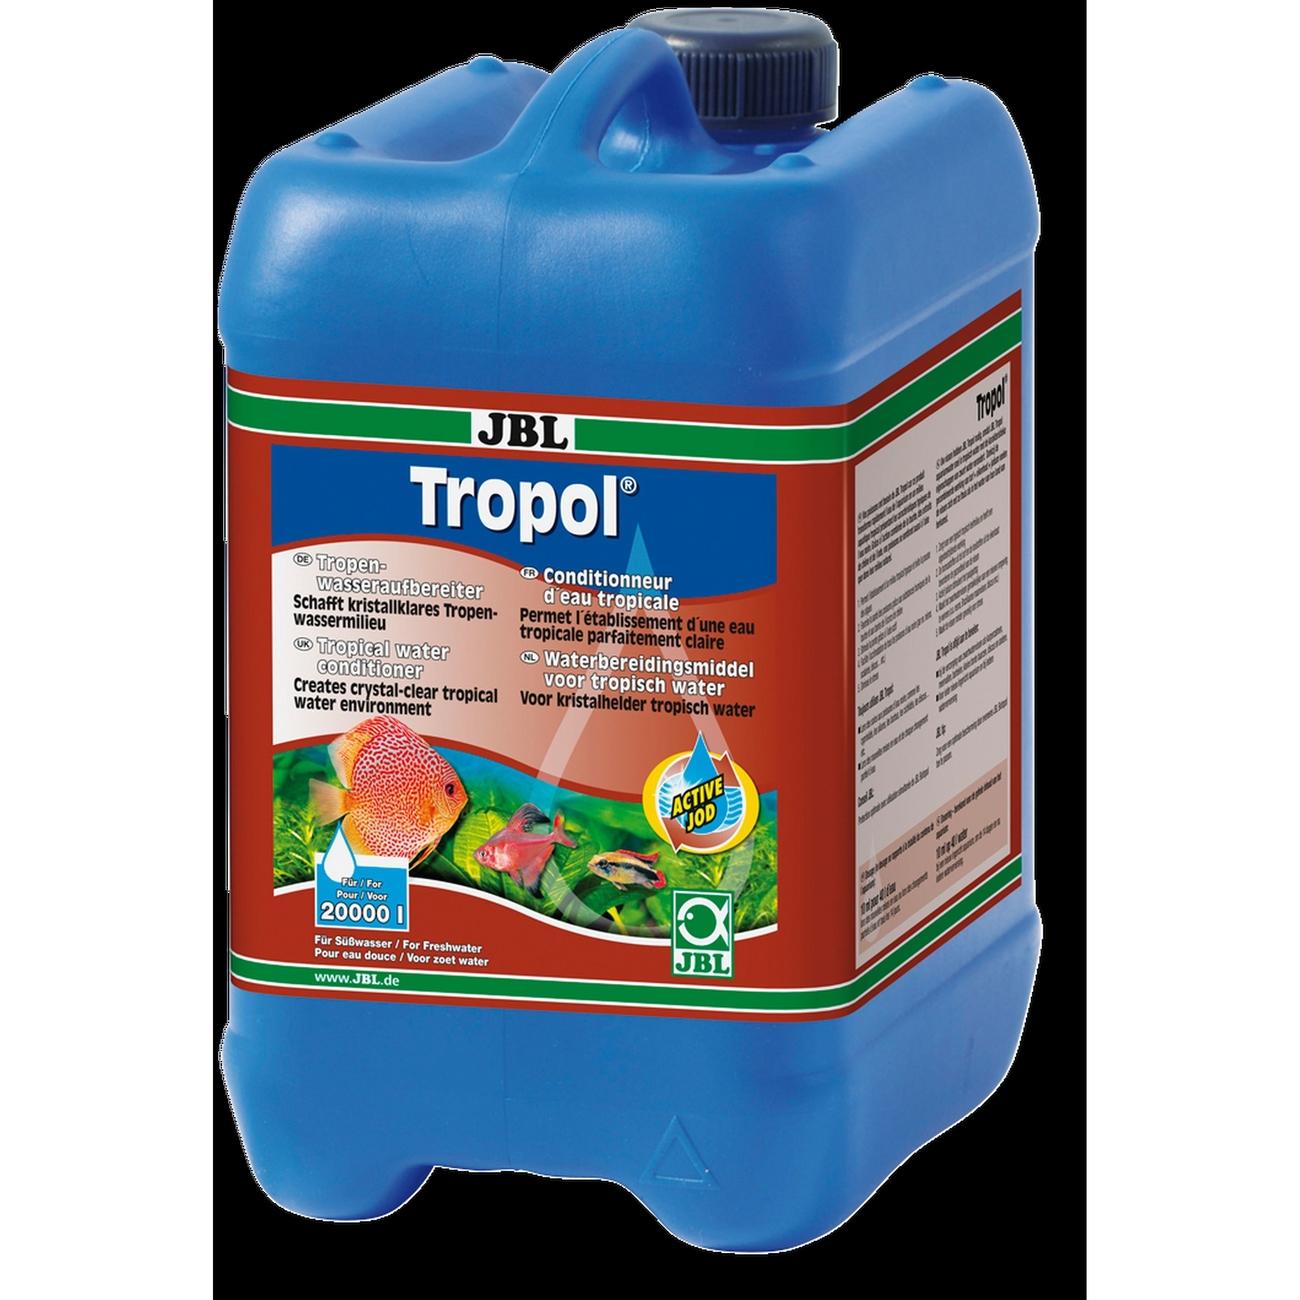 JBL Tropol Wasseraufbereiter für Süßwasser-Aquarien, 5 l